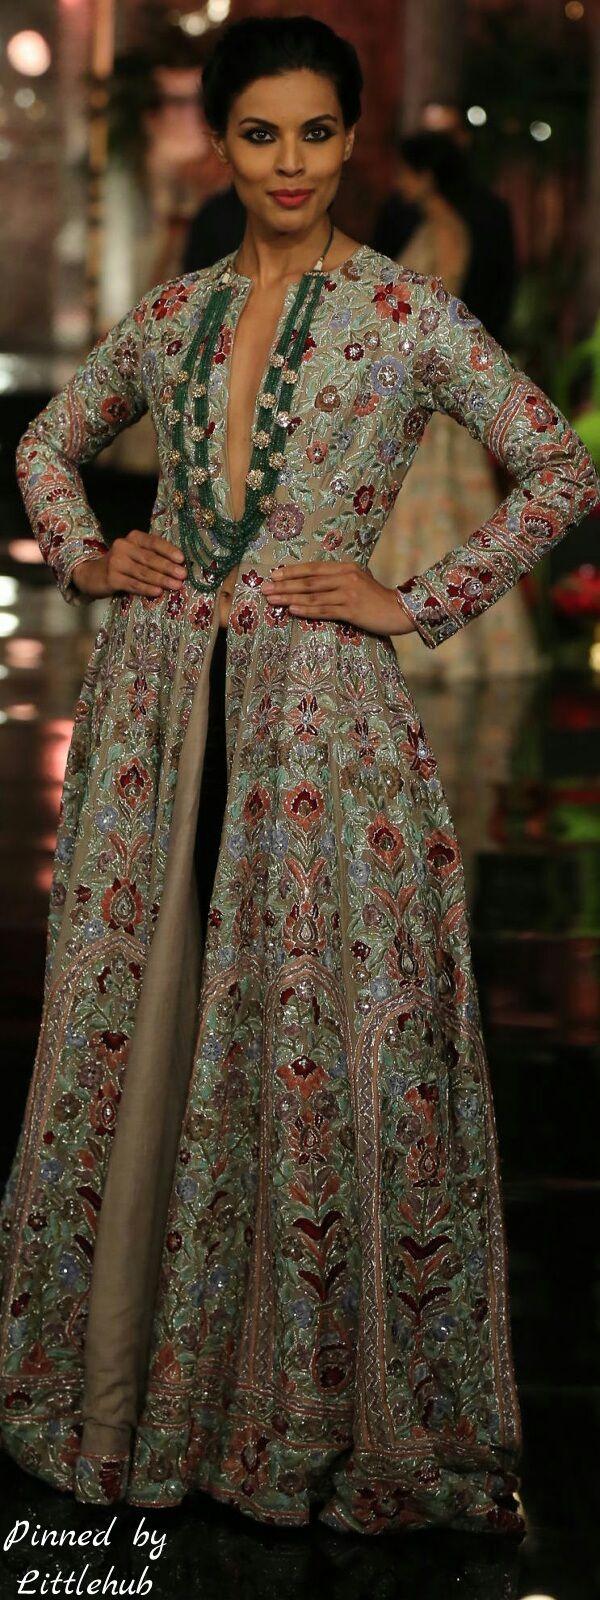 Pinterest: @Revathy Bose    คdamant love on Anarkali's ✿。。ღ    Manish Malhotra Anarkali - The Persian story